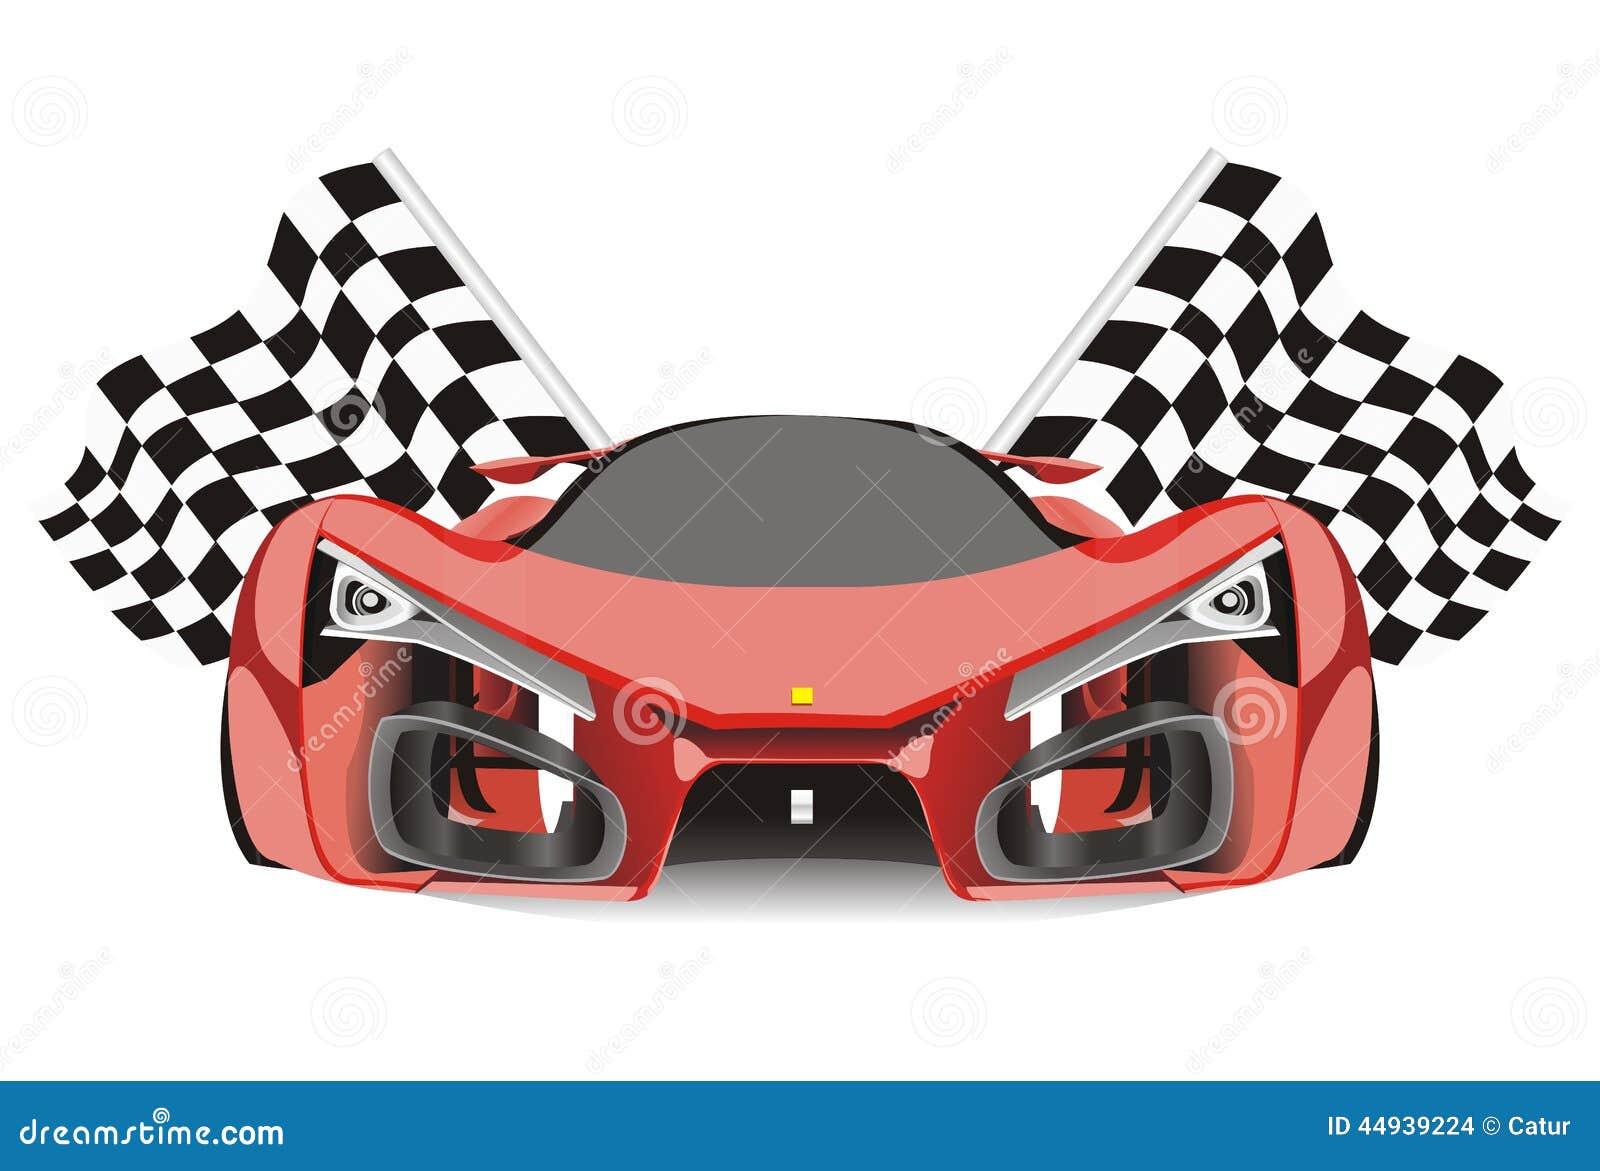 Design car flags - Vector Of Racing Flags Behind Ferrari F80 Car